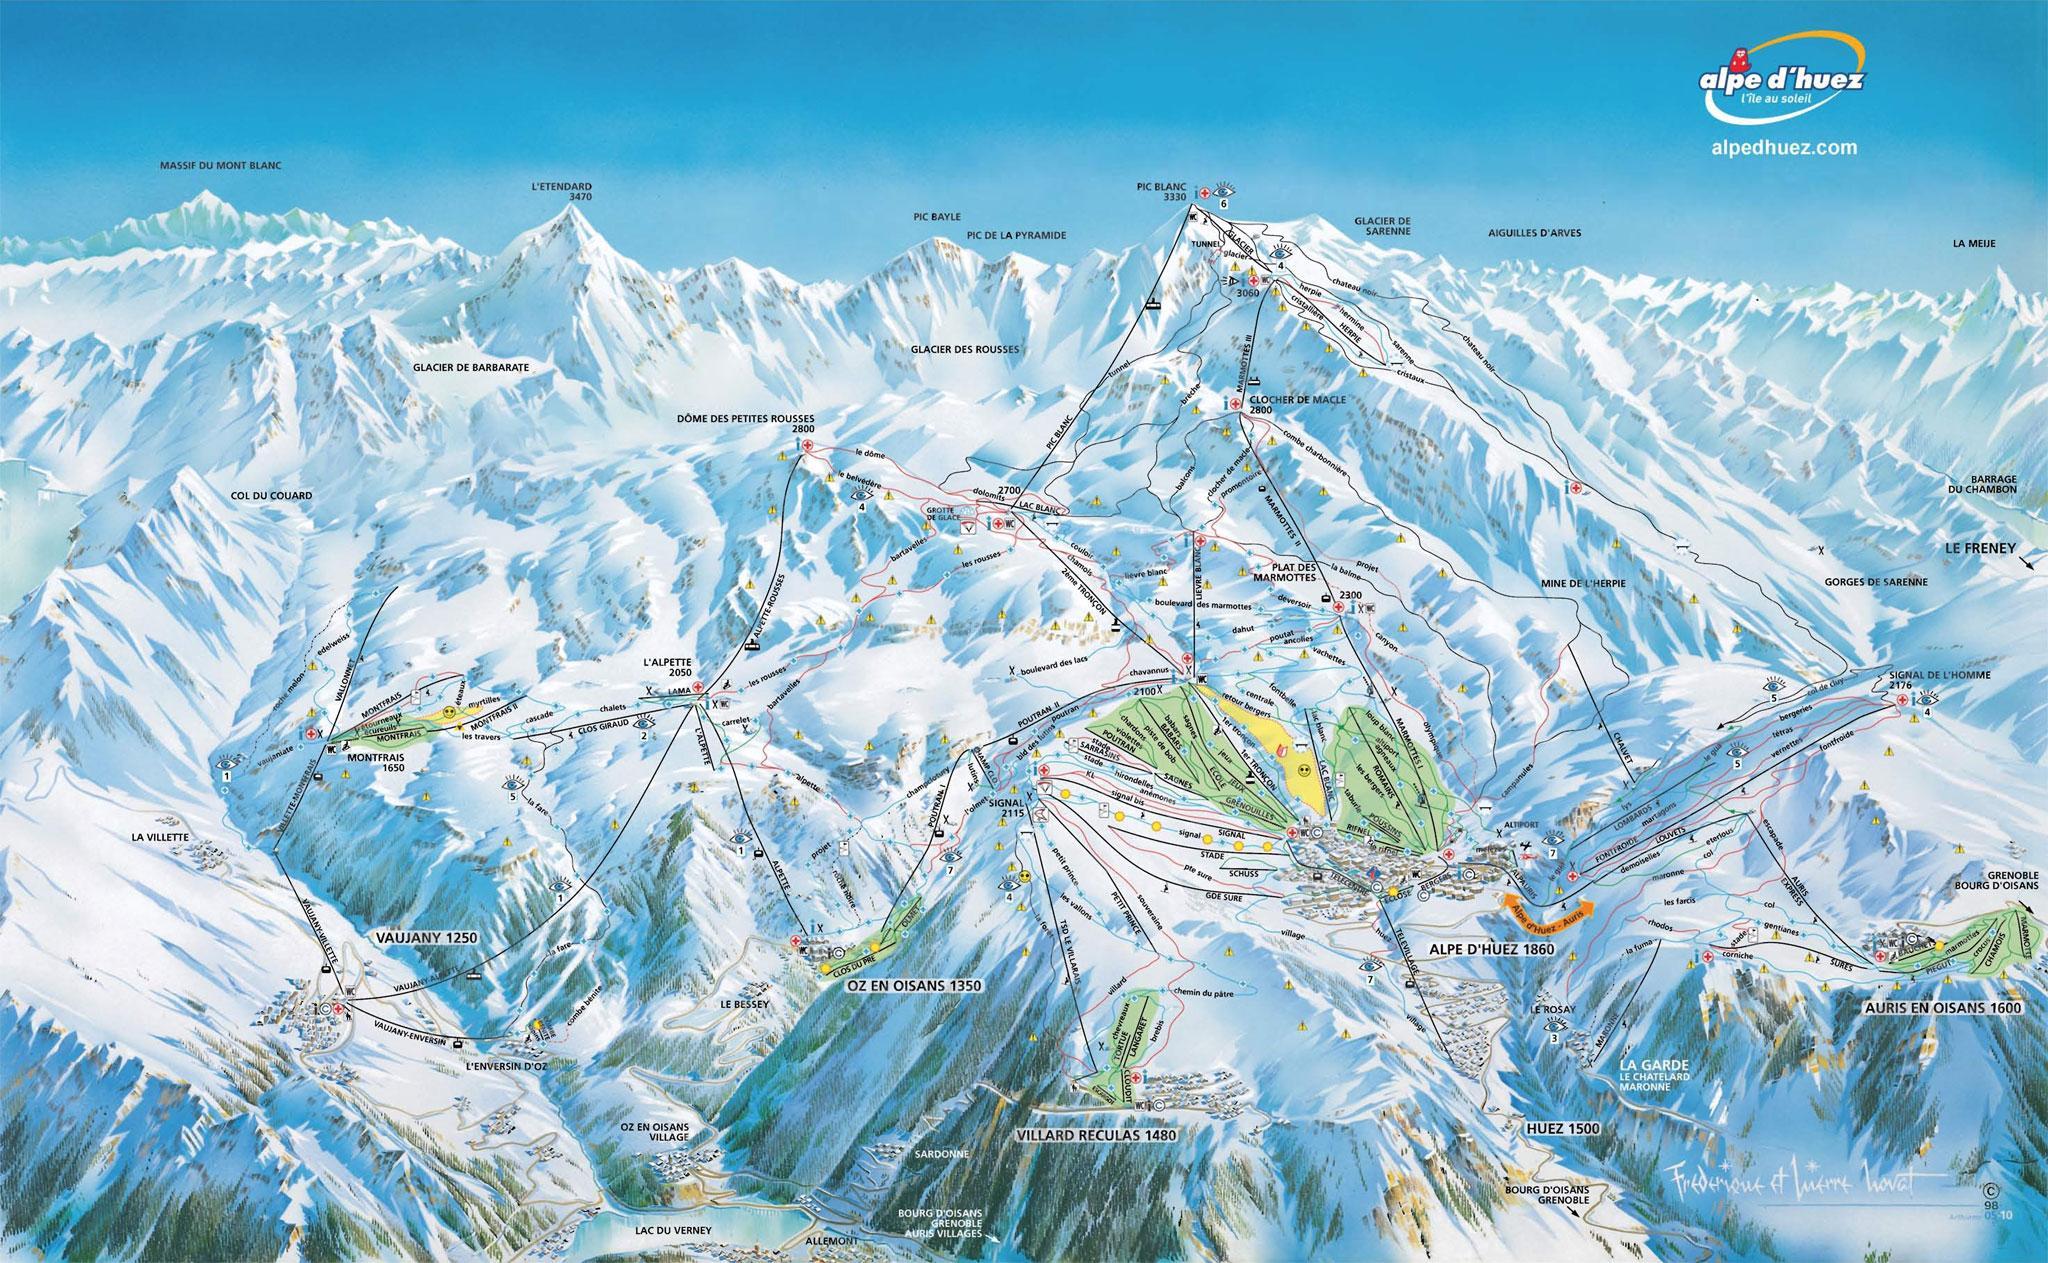 Piste Maps for French Ski Resorts J2Ski